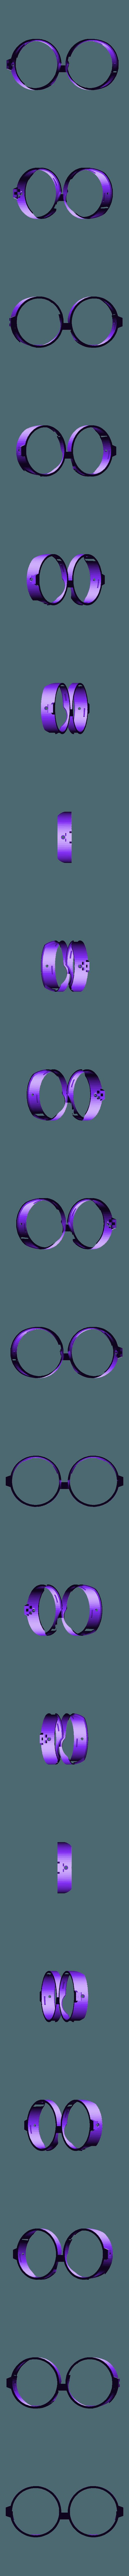 rezz-frame.stl Download free STL file Rezz-Inspired NeoPixel Glasses • 3D printing template, Adafruit